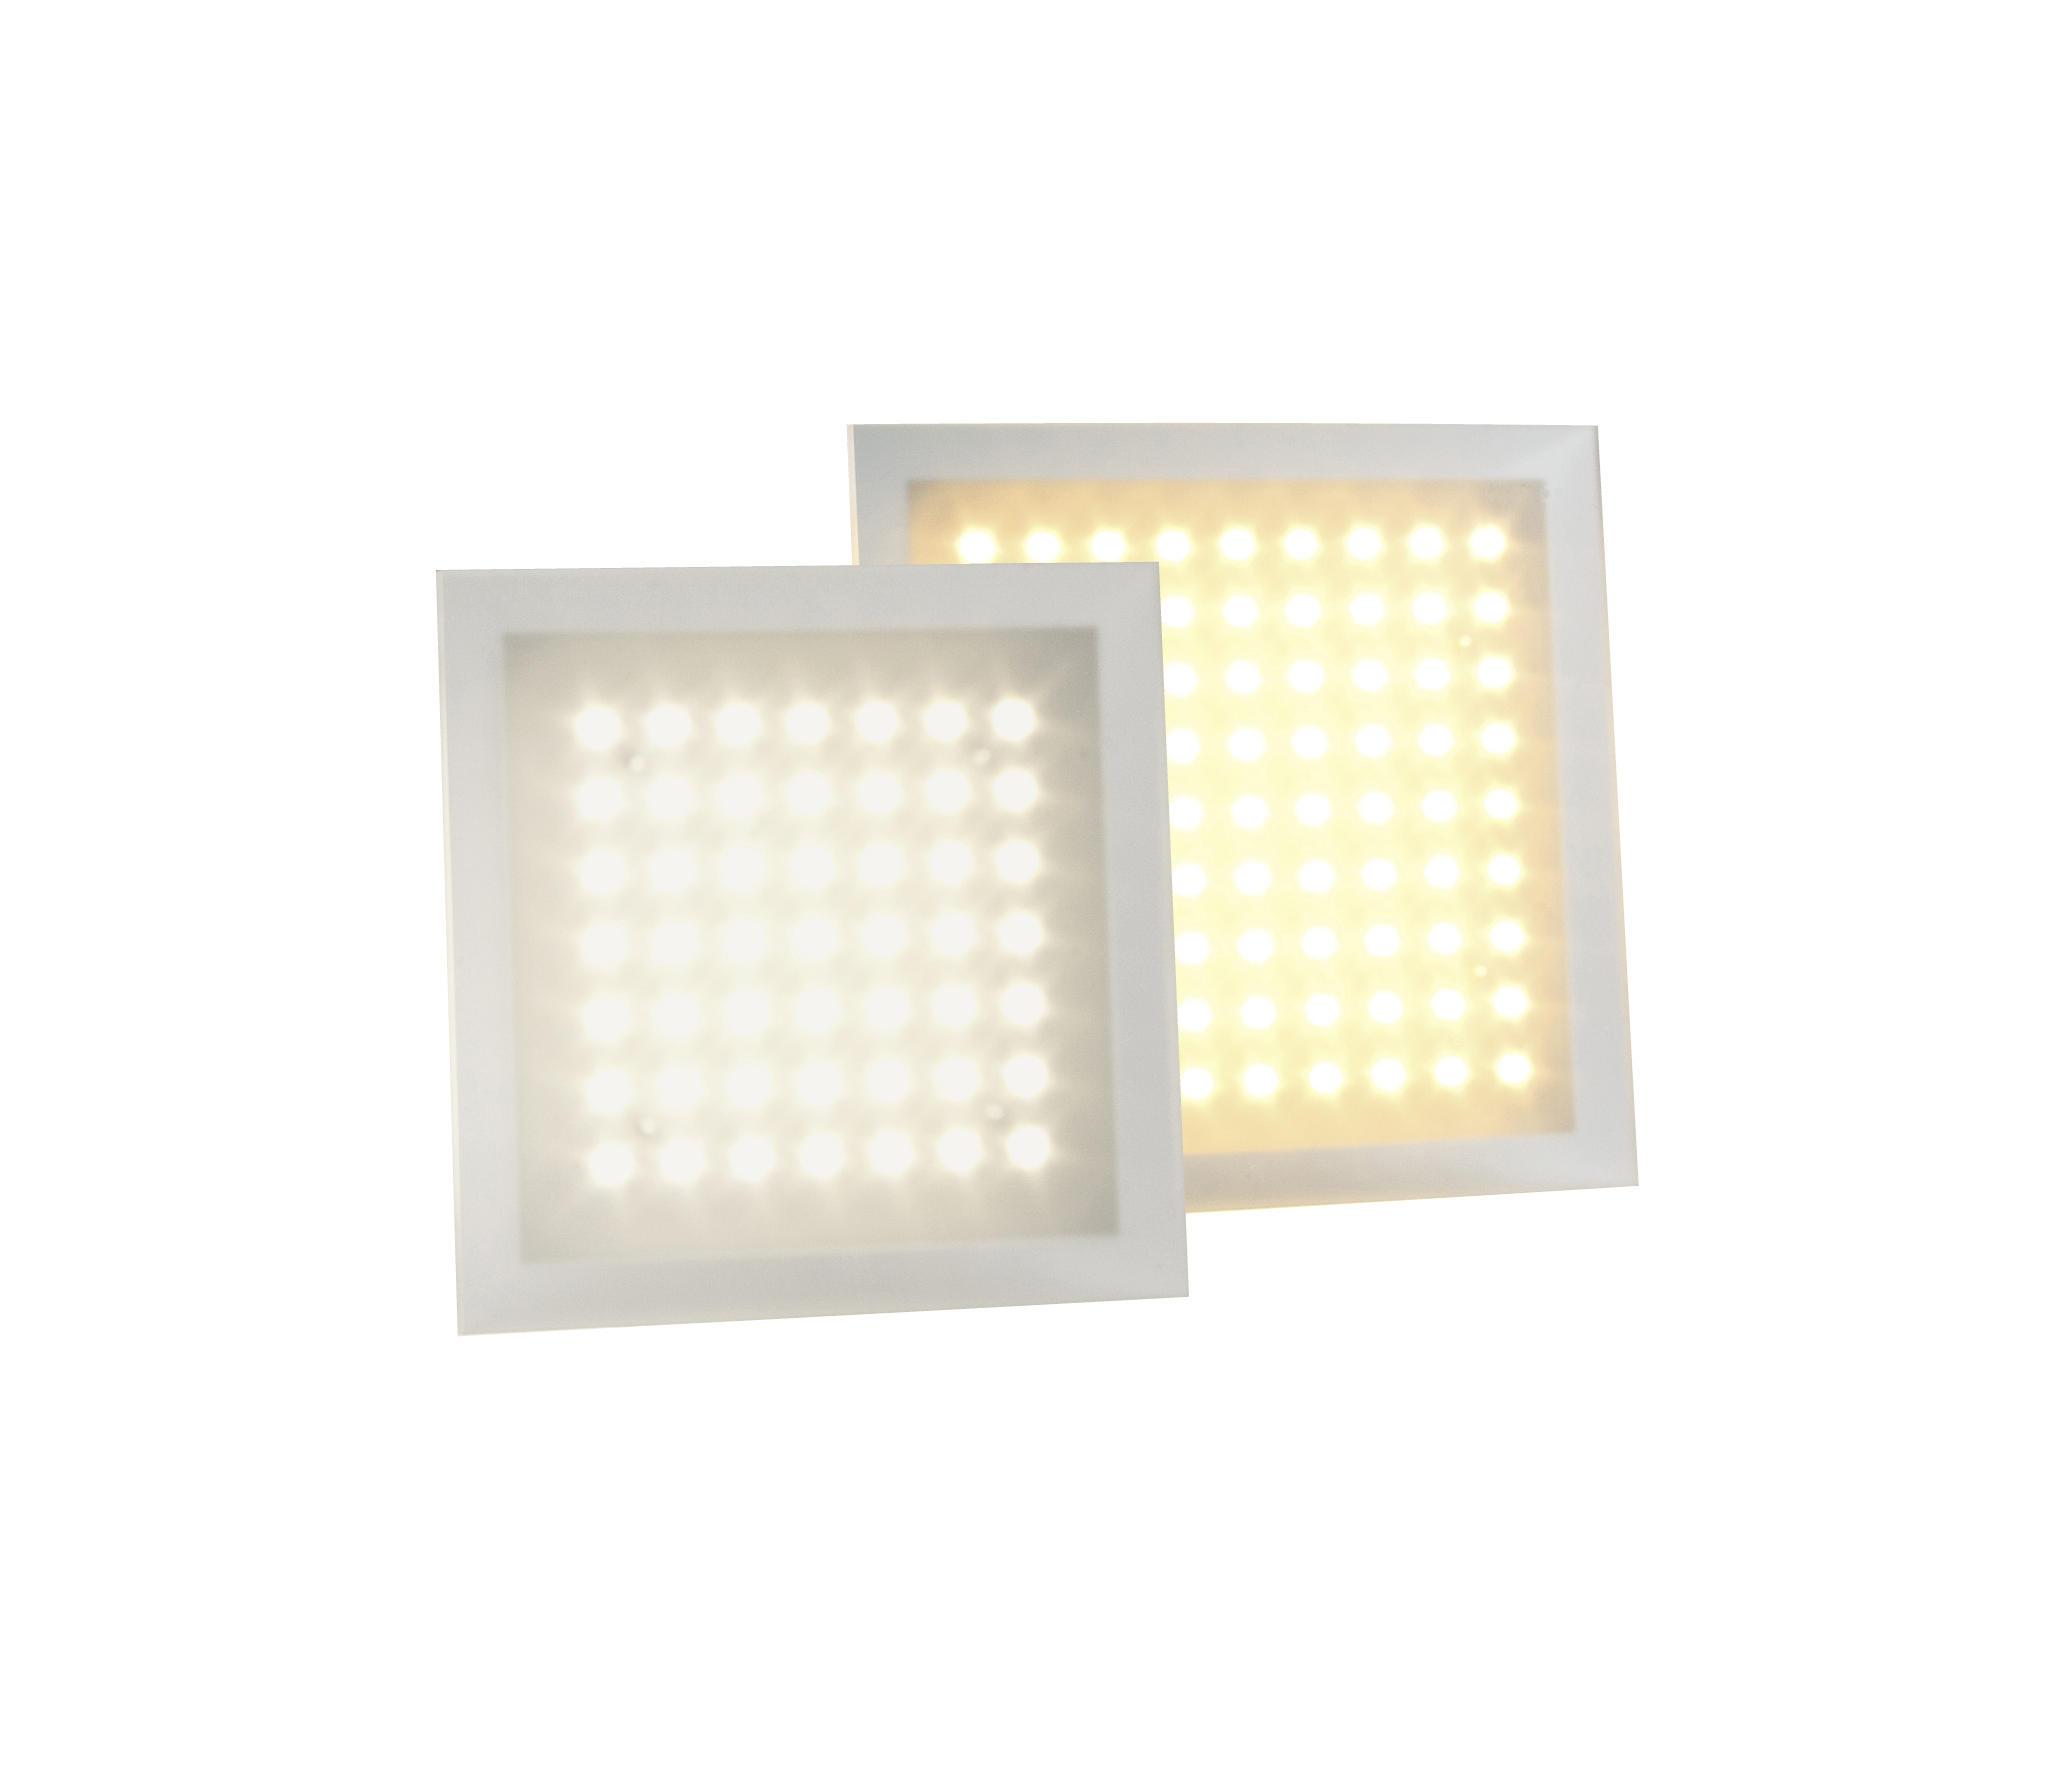 Clickled 49 81 24v dc ceiling light by unex ceiling lights